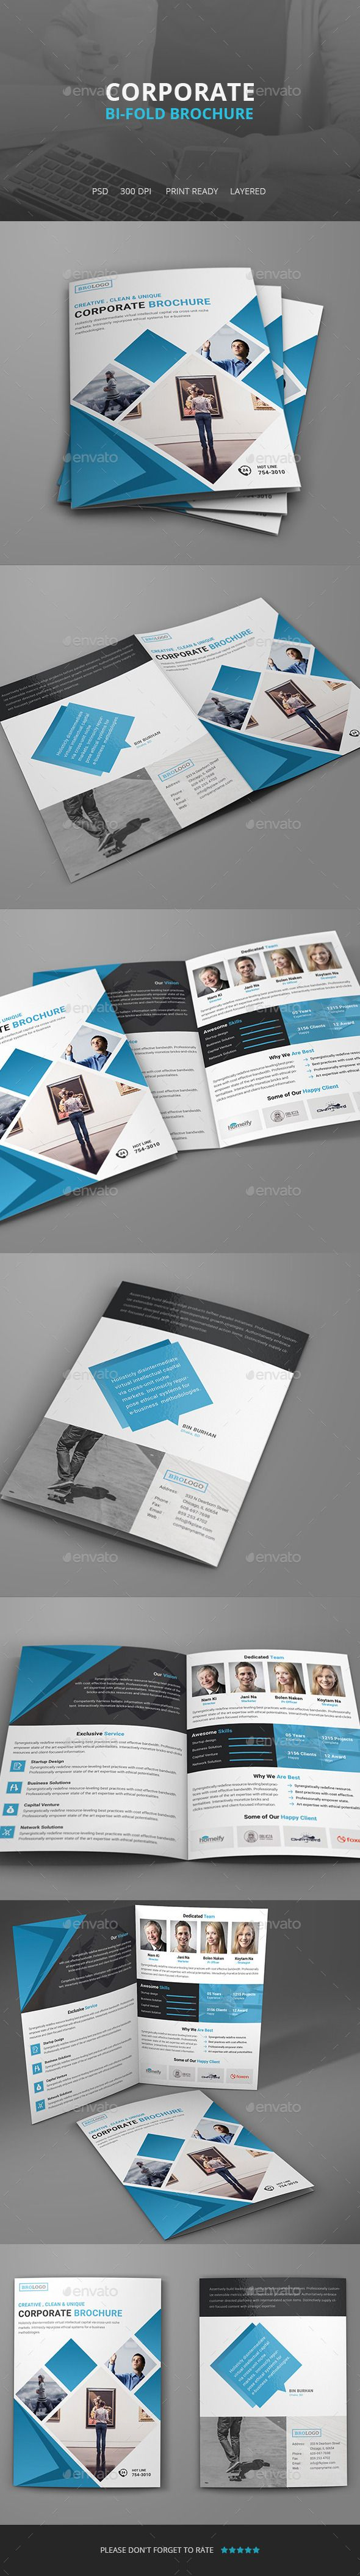 Corporate Bi-Fold Brochure Tempalte #design #brochure Download: http://graphicriver.net/item/corporate-bifold-brochure-/11686116?ref=ksioks